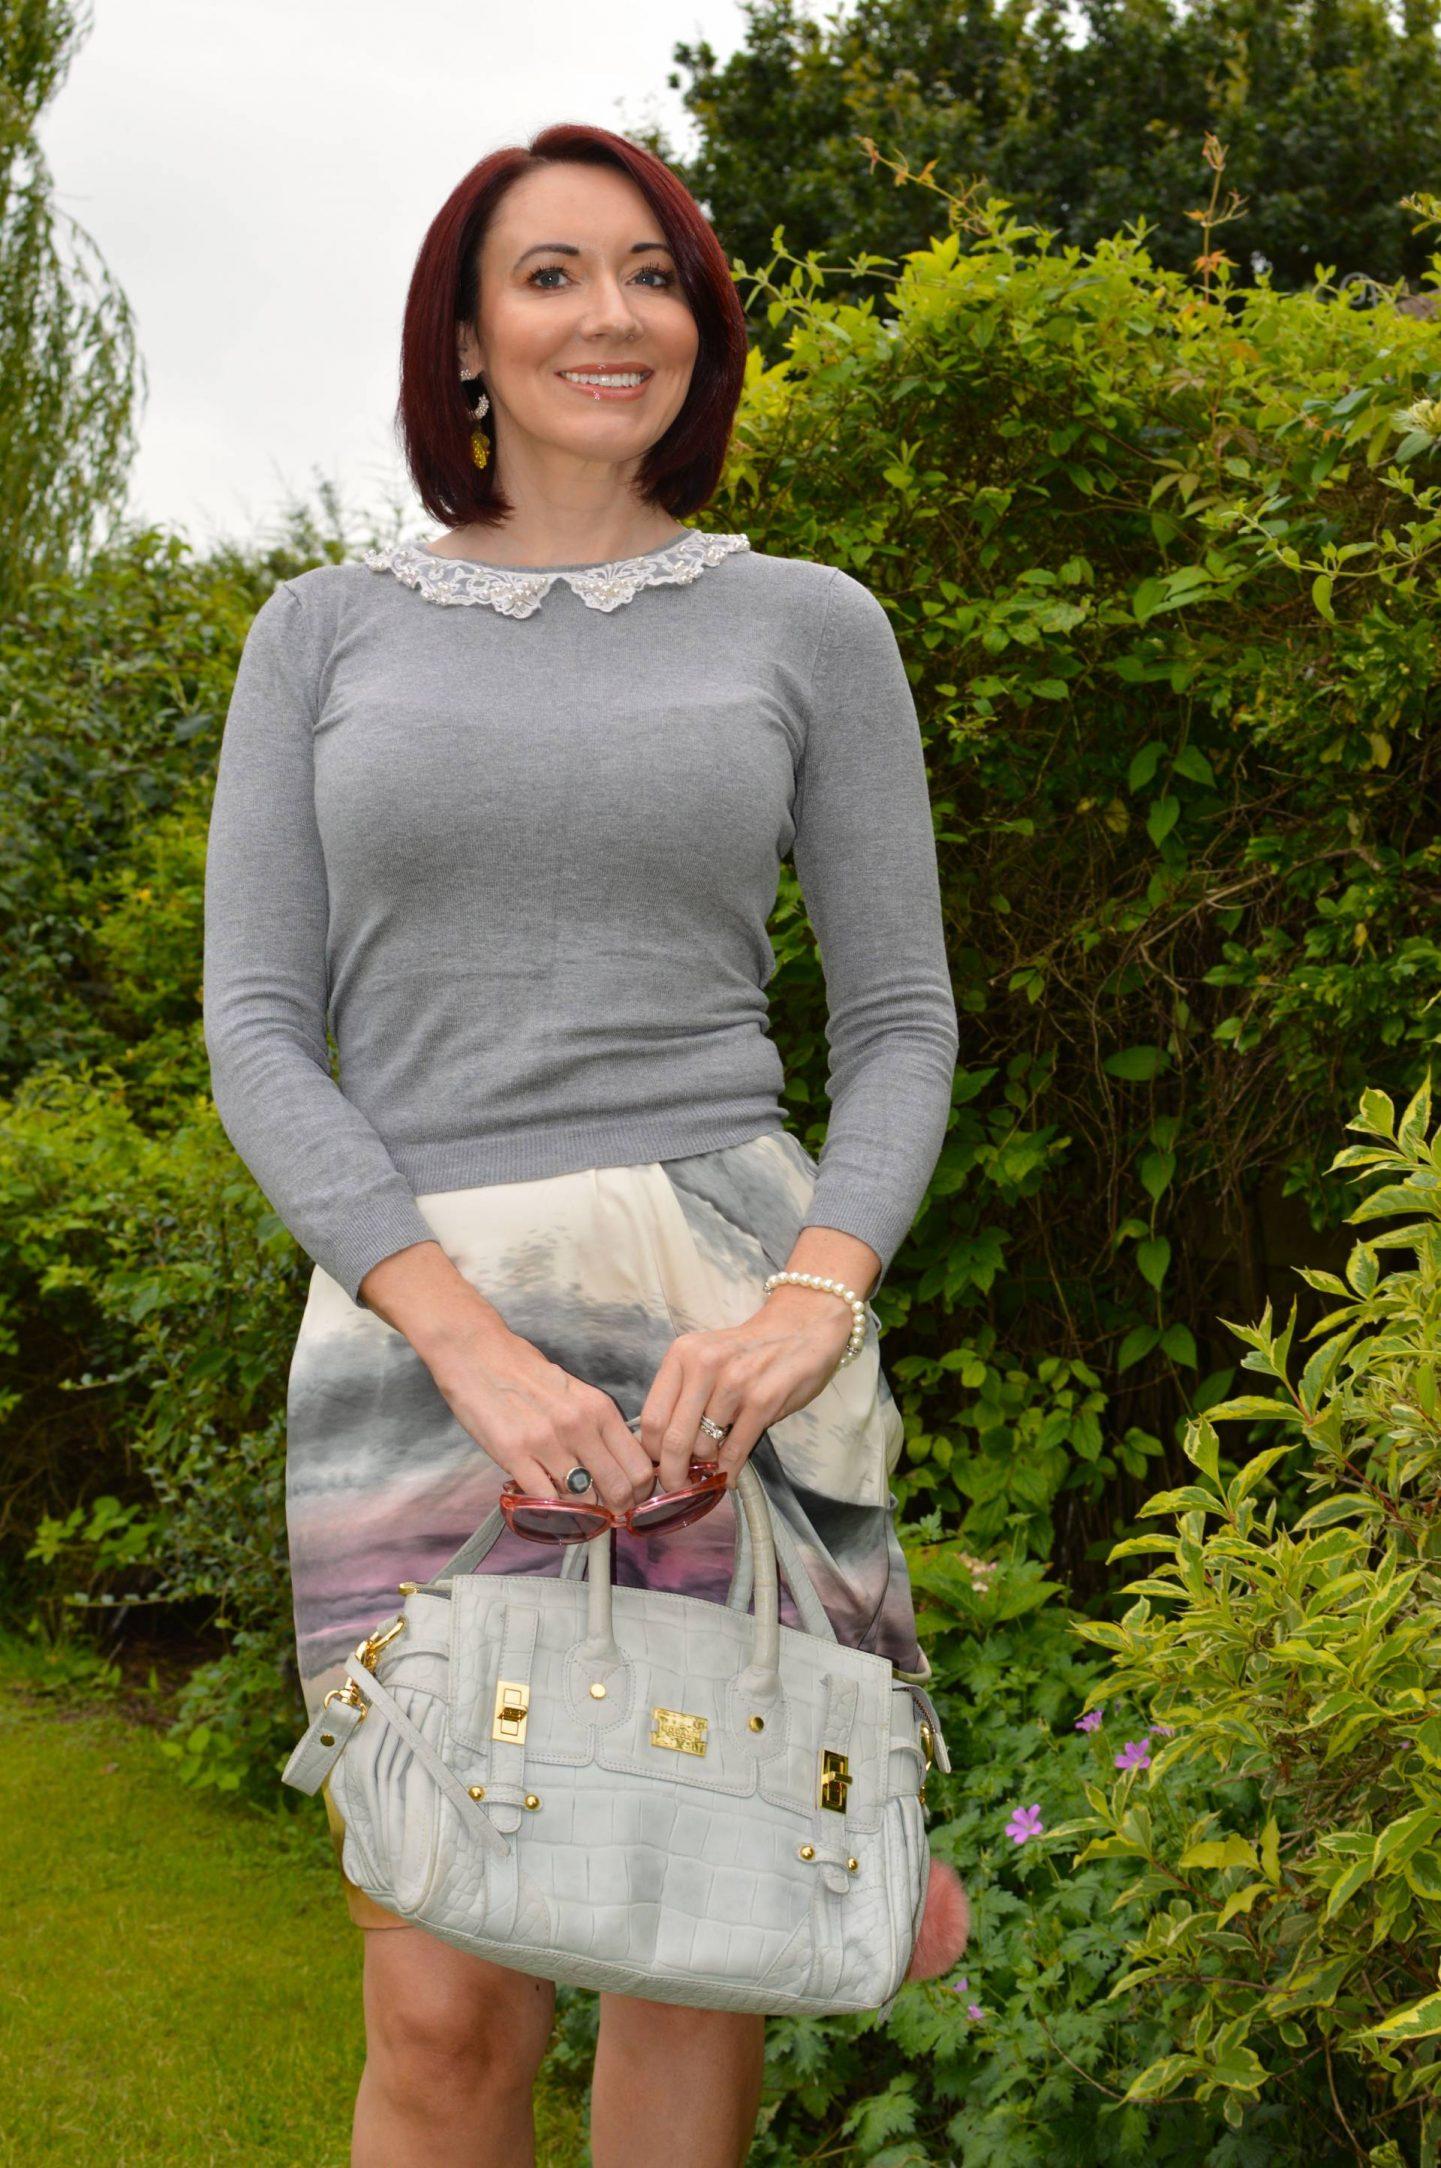 Fallin' For Tie Dye - Stylish Monday Link Up, Snob London tie dye skirt, Modalu grey satchel